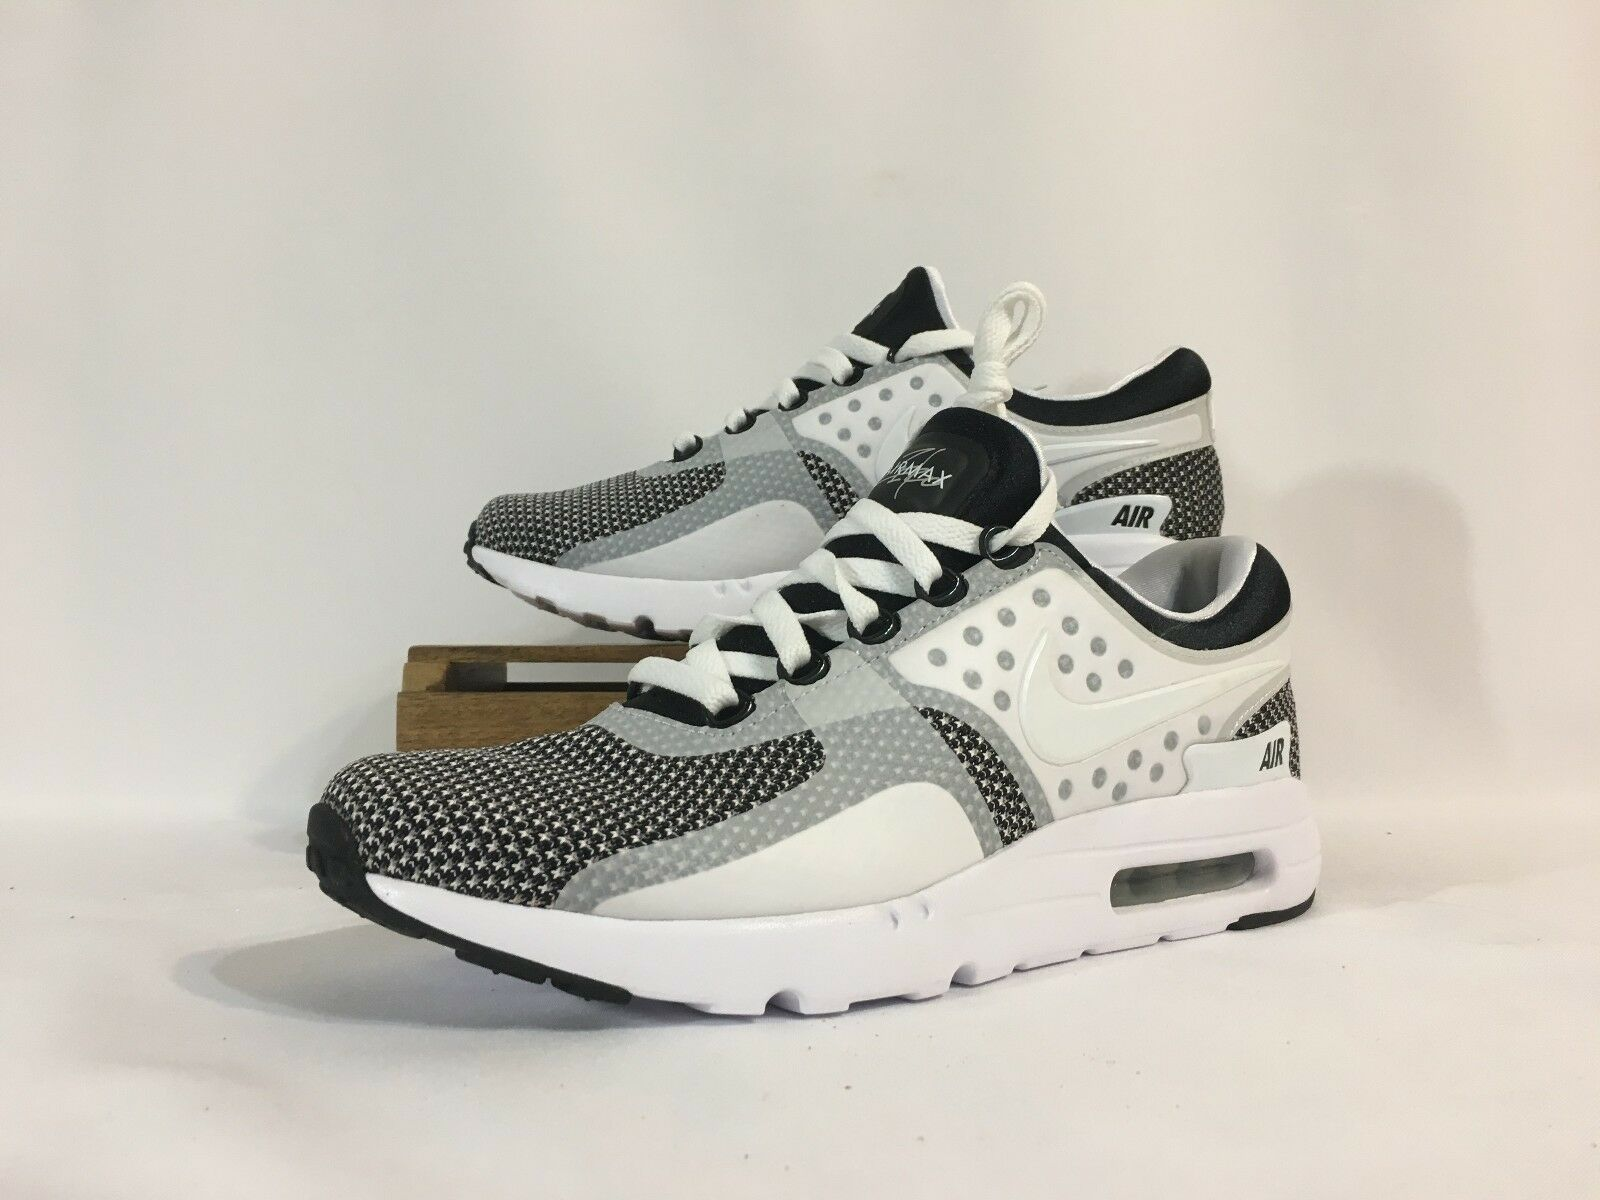 Nike Air Max Zero Essential Running shoes White Black 876070-005 Men's 13 NWOB